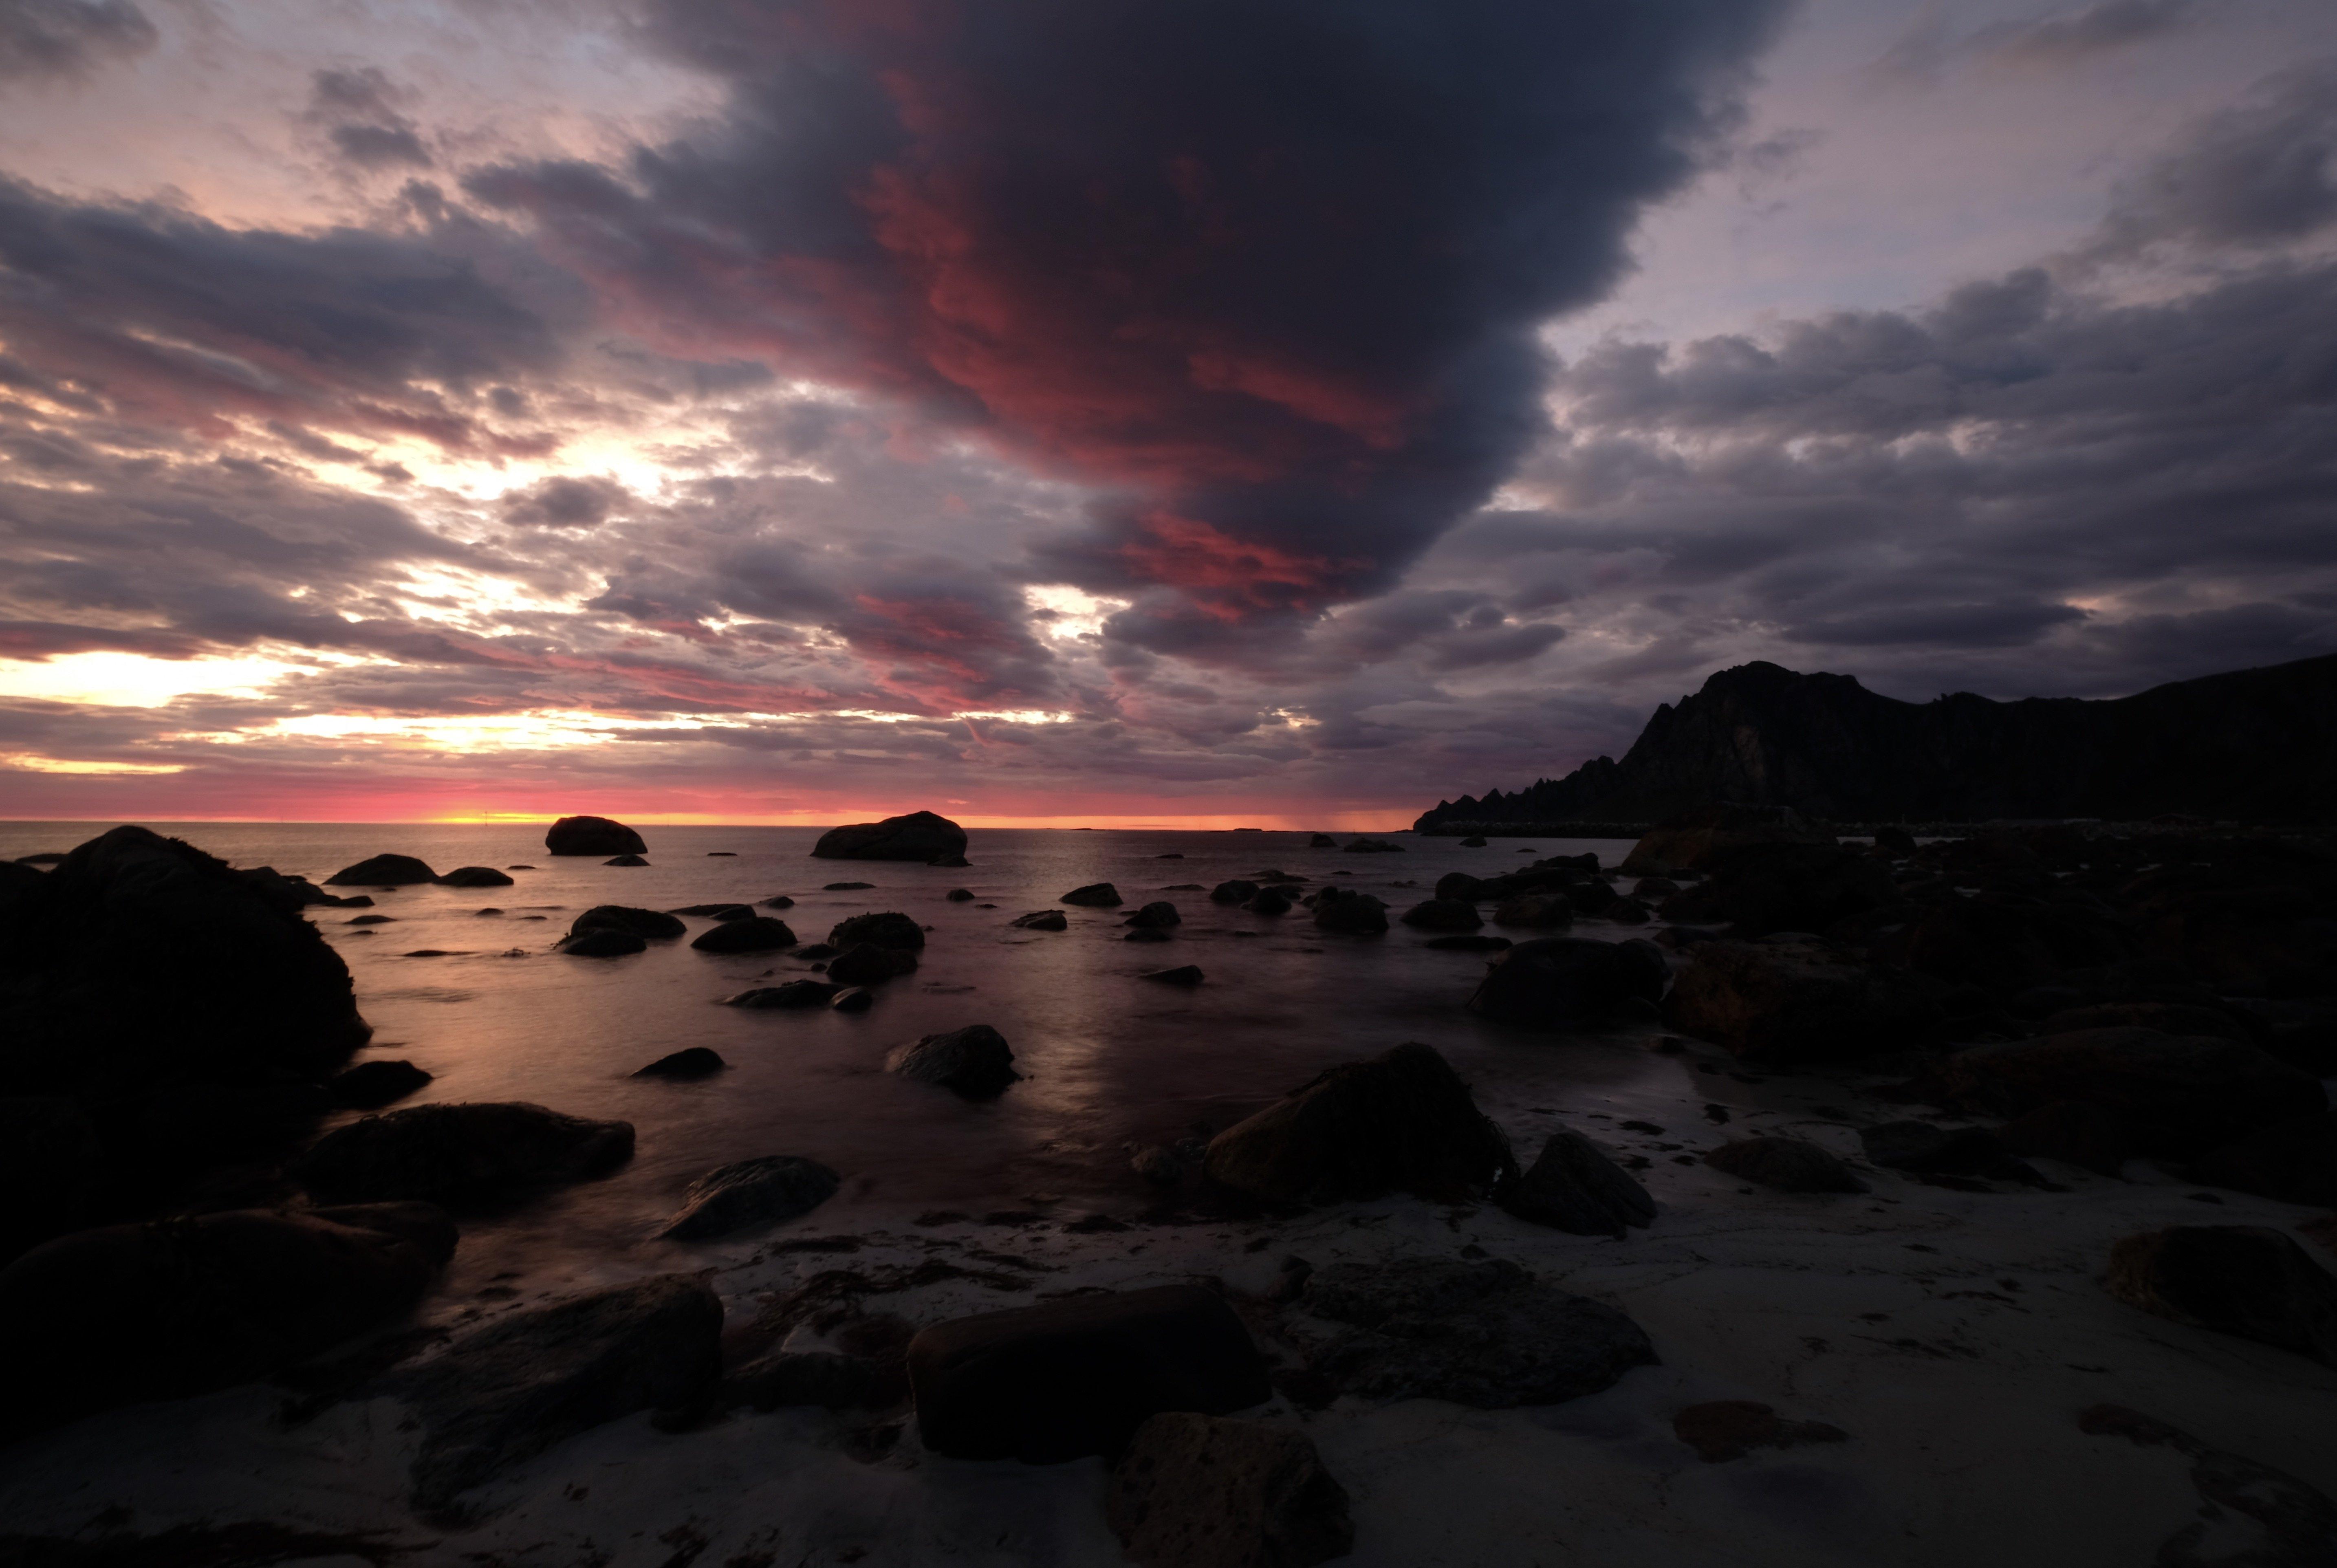 Landscapes, nature, Norway, sunset, colors, sky, clouds, rocks, mountain, Andøya, island, sea, Atlantic sea,, Povarova Ree Svetlana